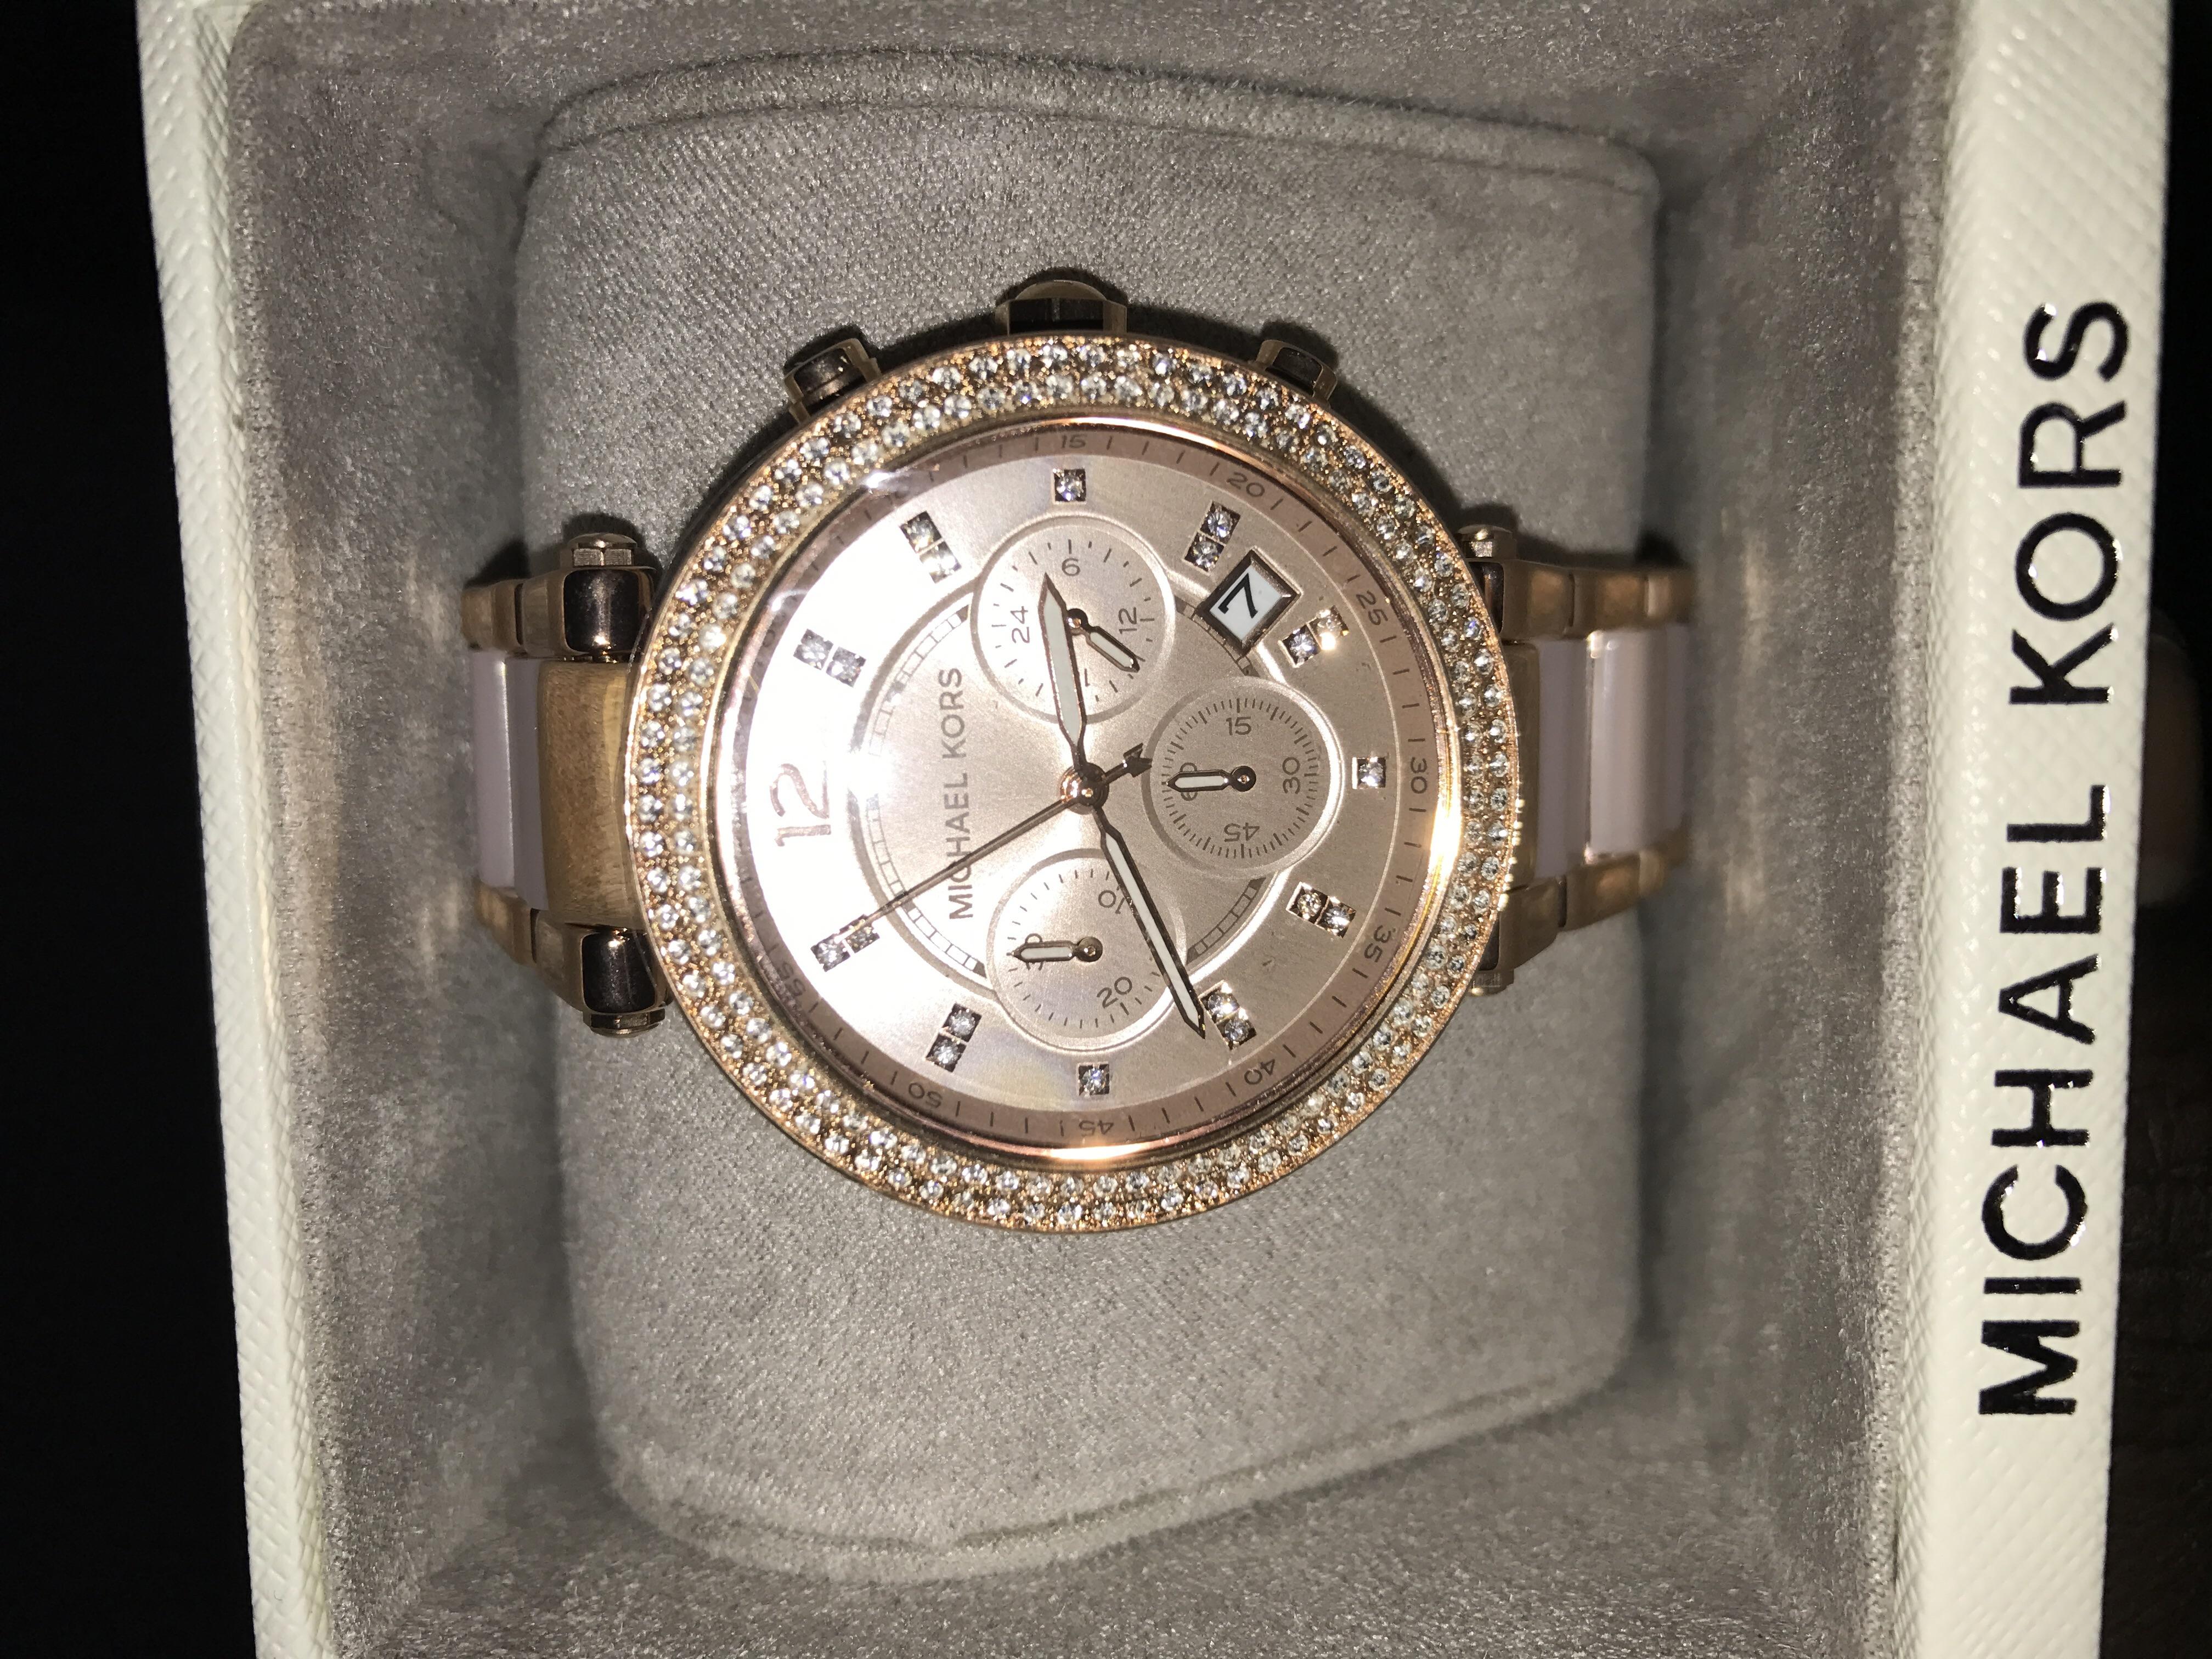 Holiday Gift Idea: Michael Kors Medium Leather Bag $160